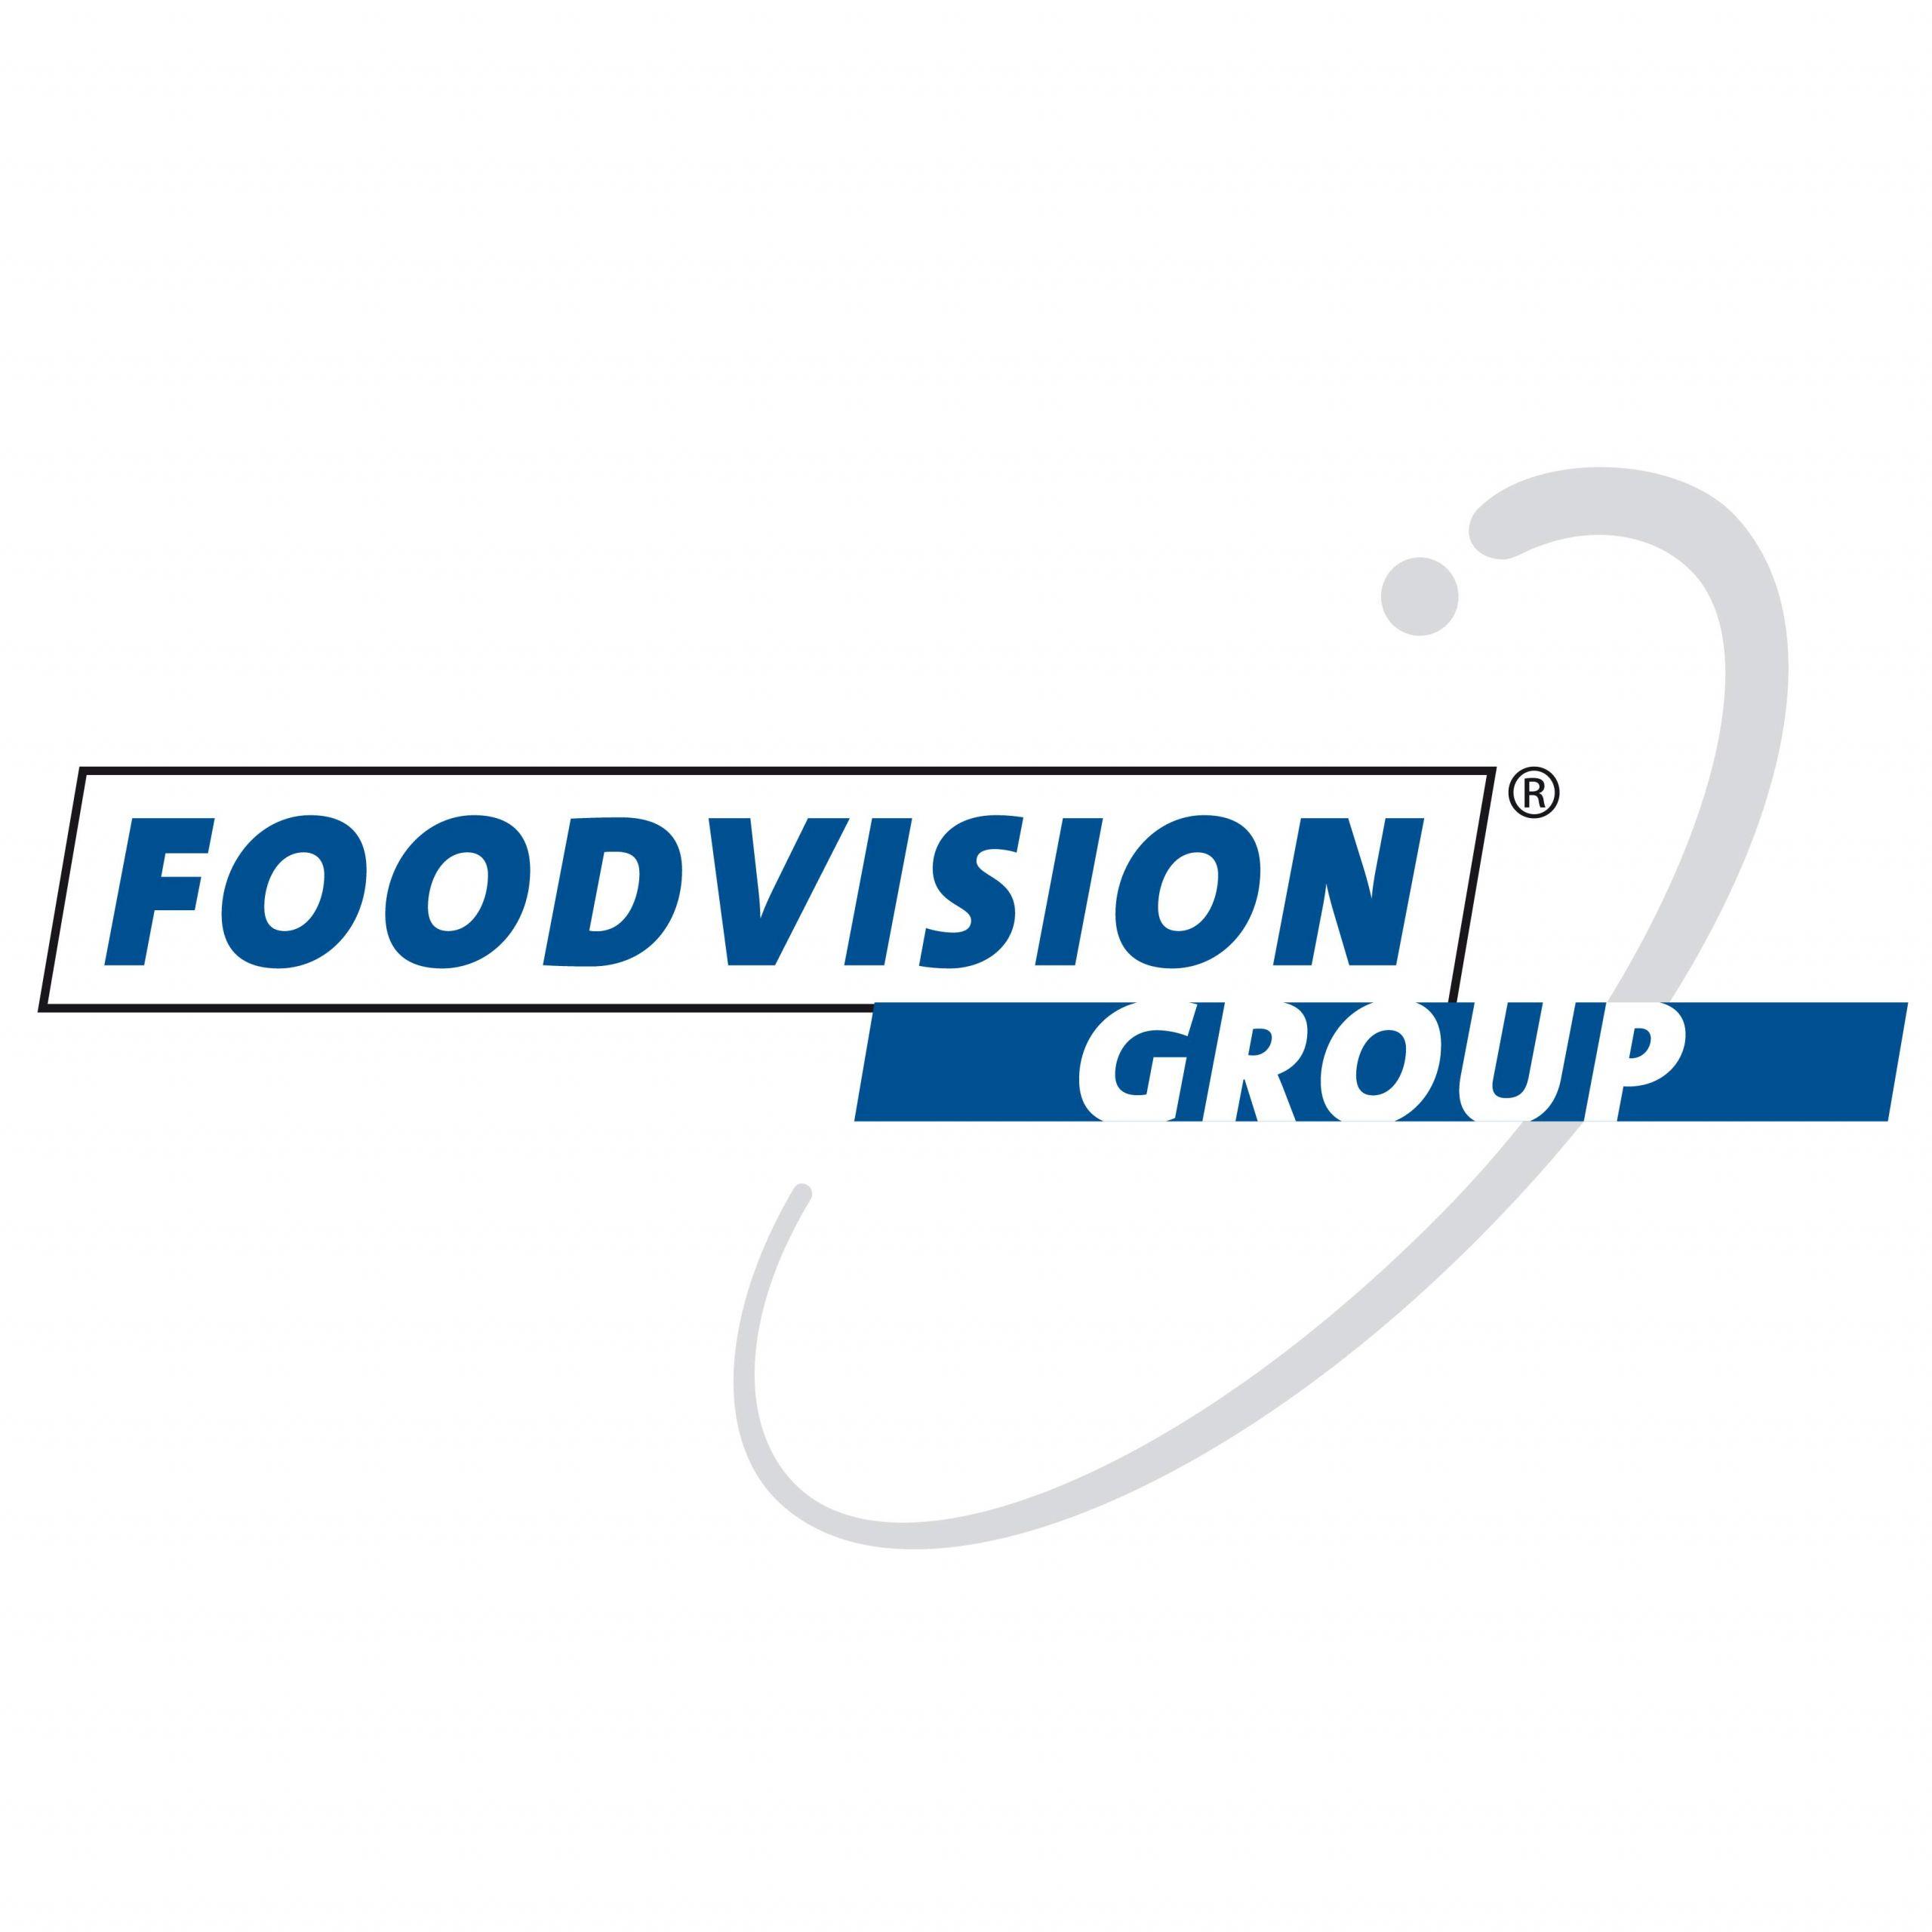 foodvision group 300dpi rgb